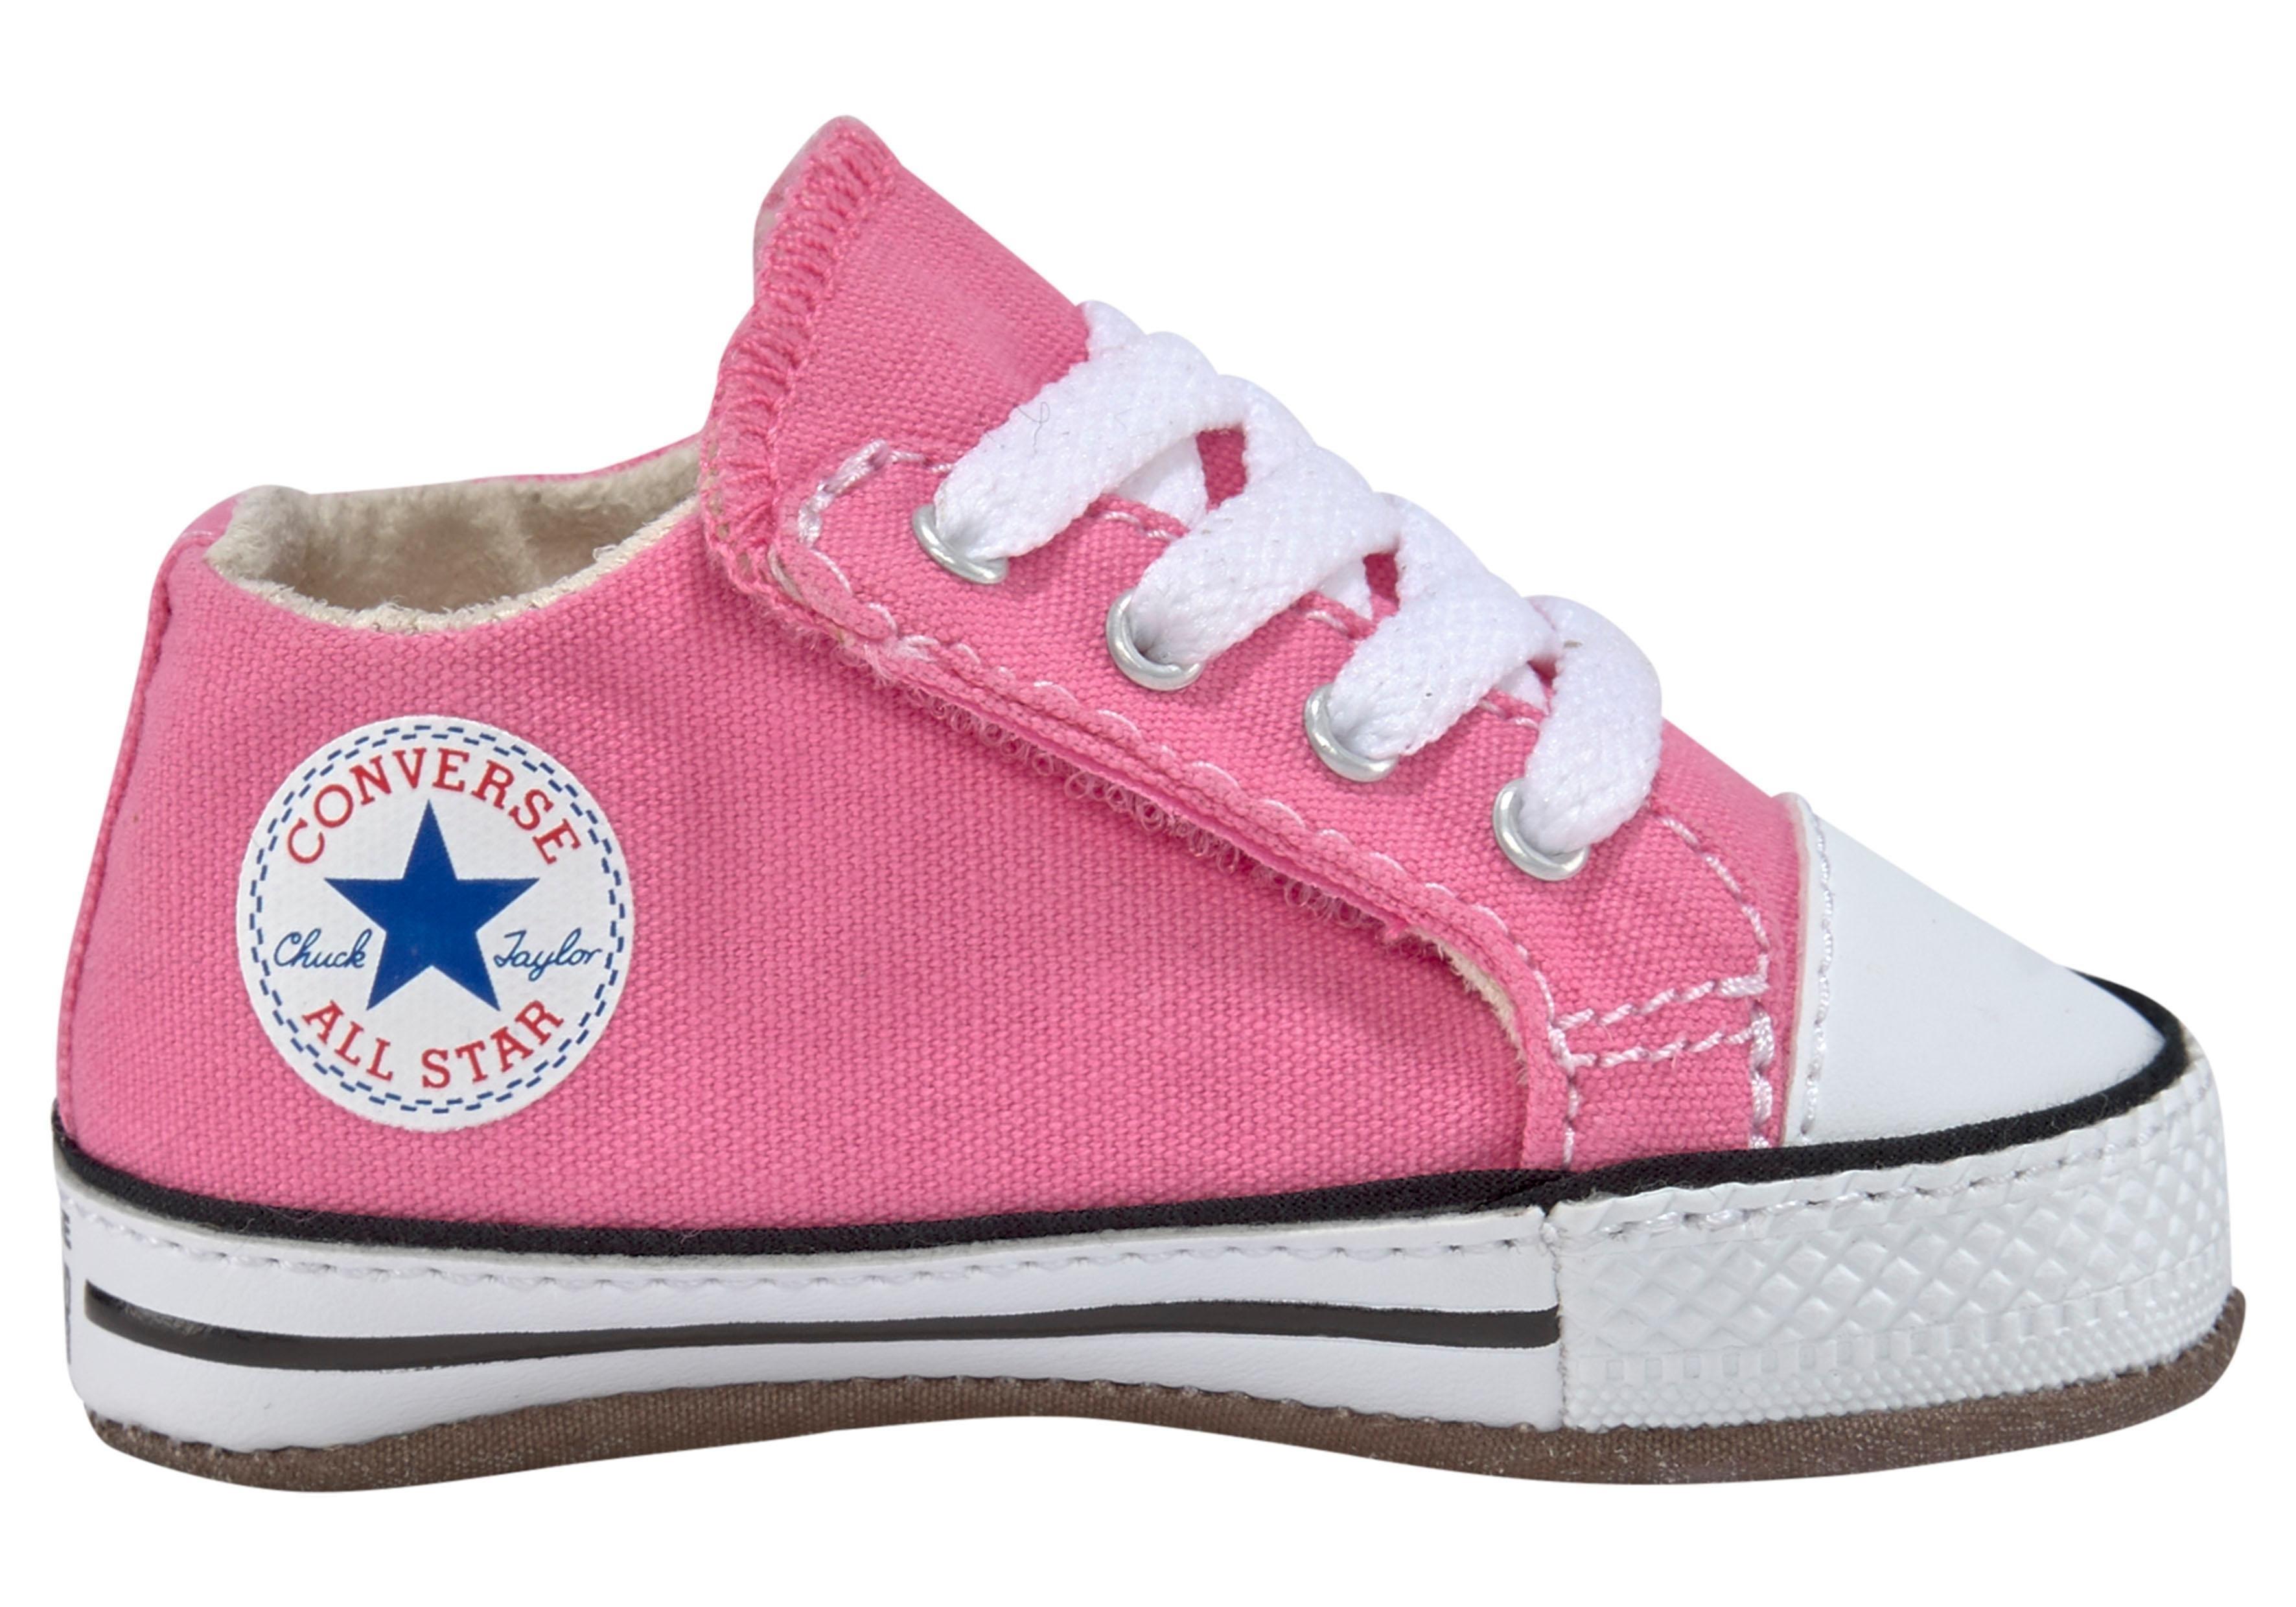 Converse babyschoentjes Chuck Taylor All Star CRIBSTER CANVAS COL bestellen: 30 dagen bedenktijd